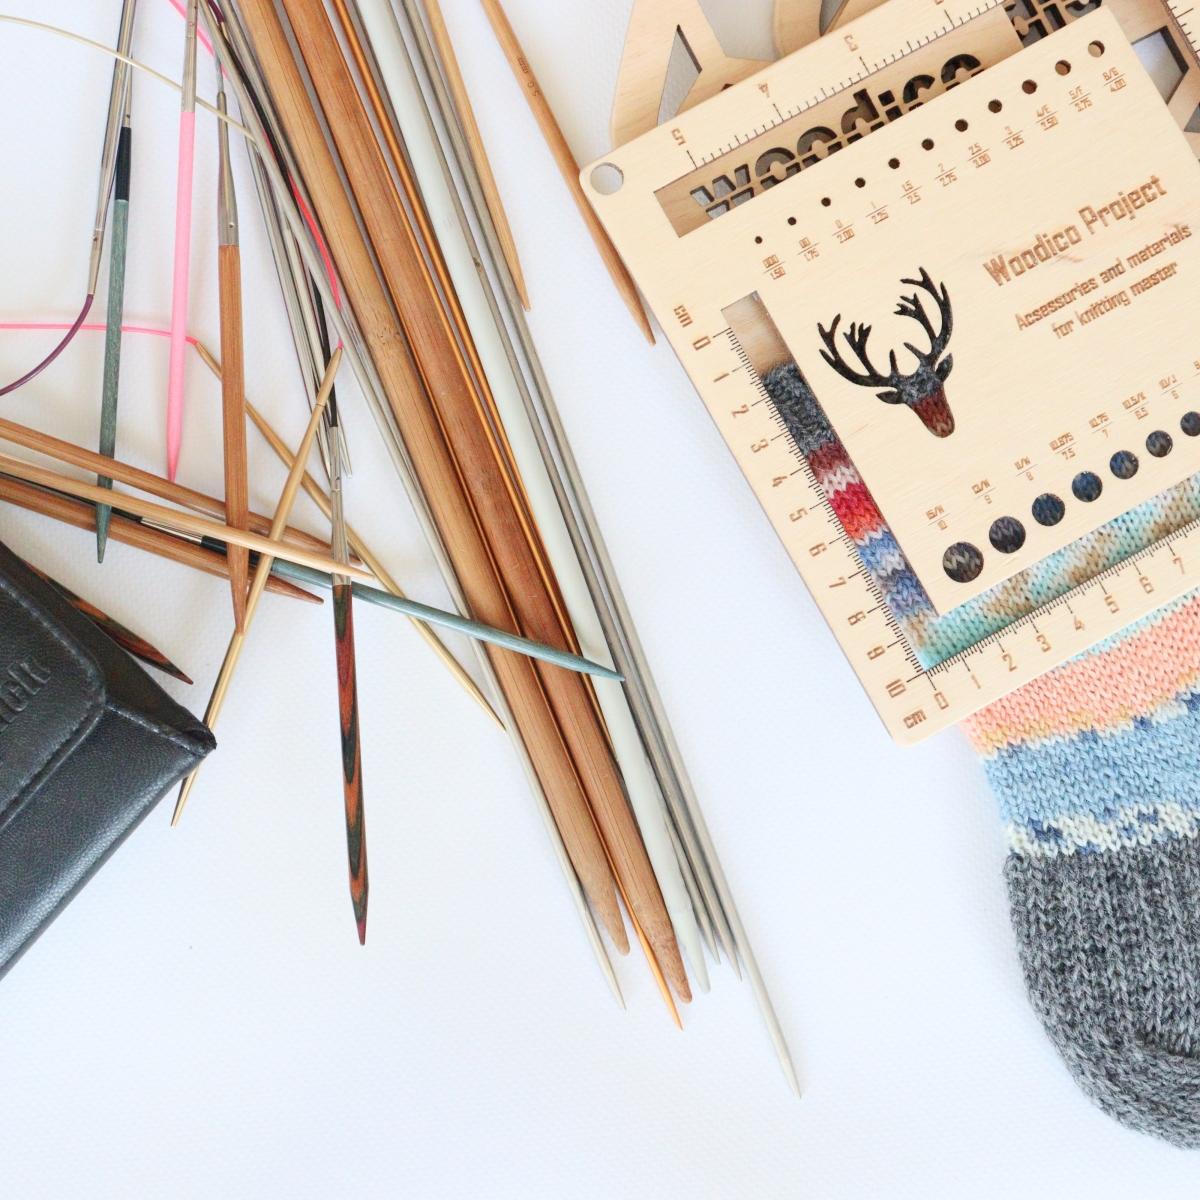 woodico.pro knitmetr 7 1200x1200 - Knitting needle gauge and ruler / Knitmetr